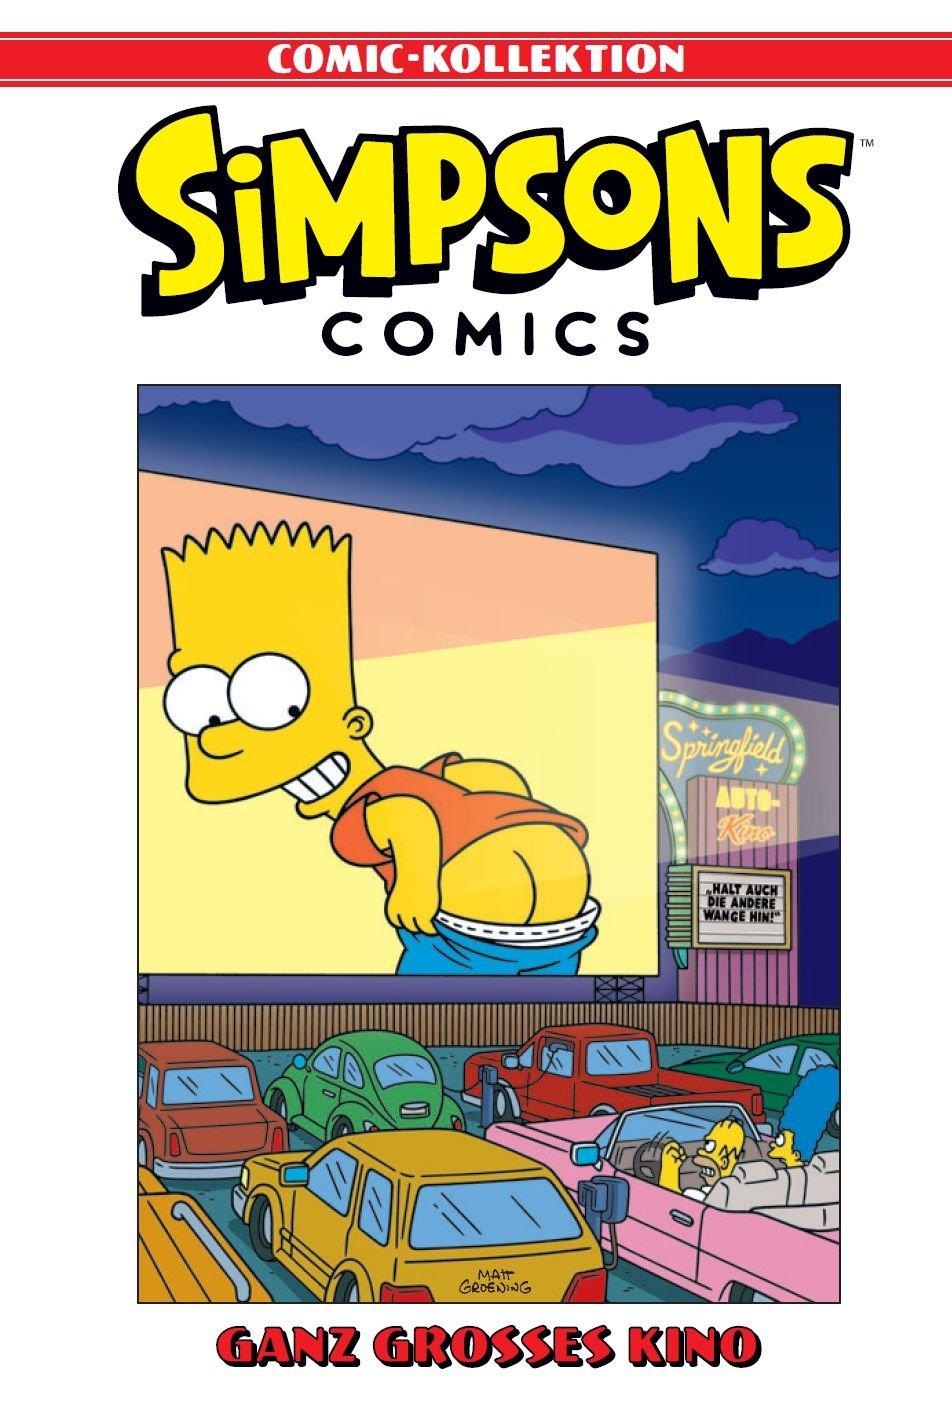 Simpsons Comic Kollektion  Bd. 9  Ganz Großes Kino